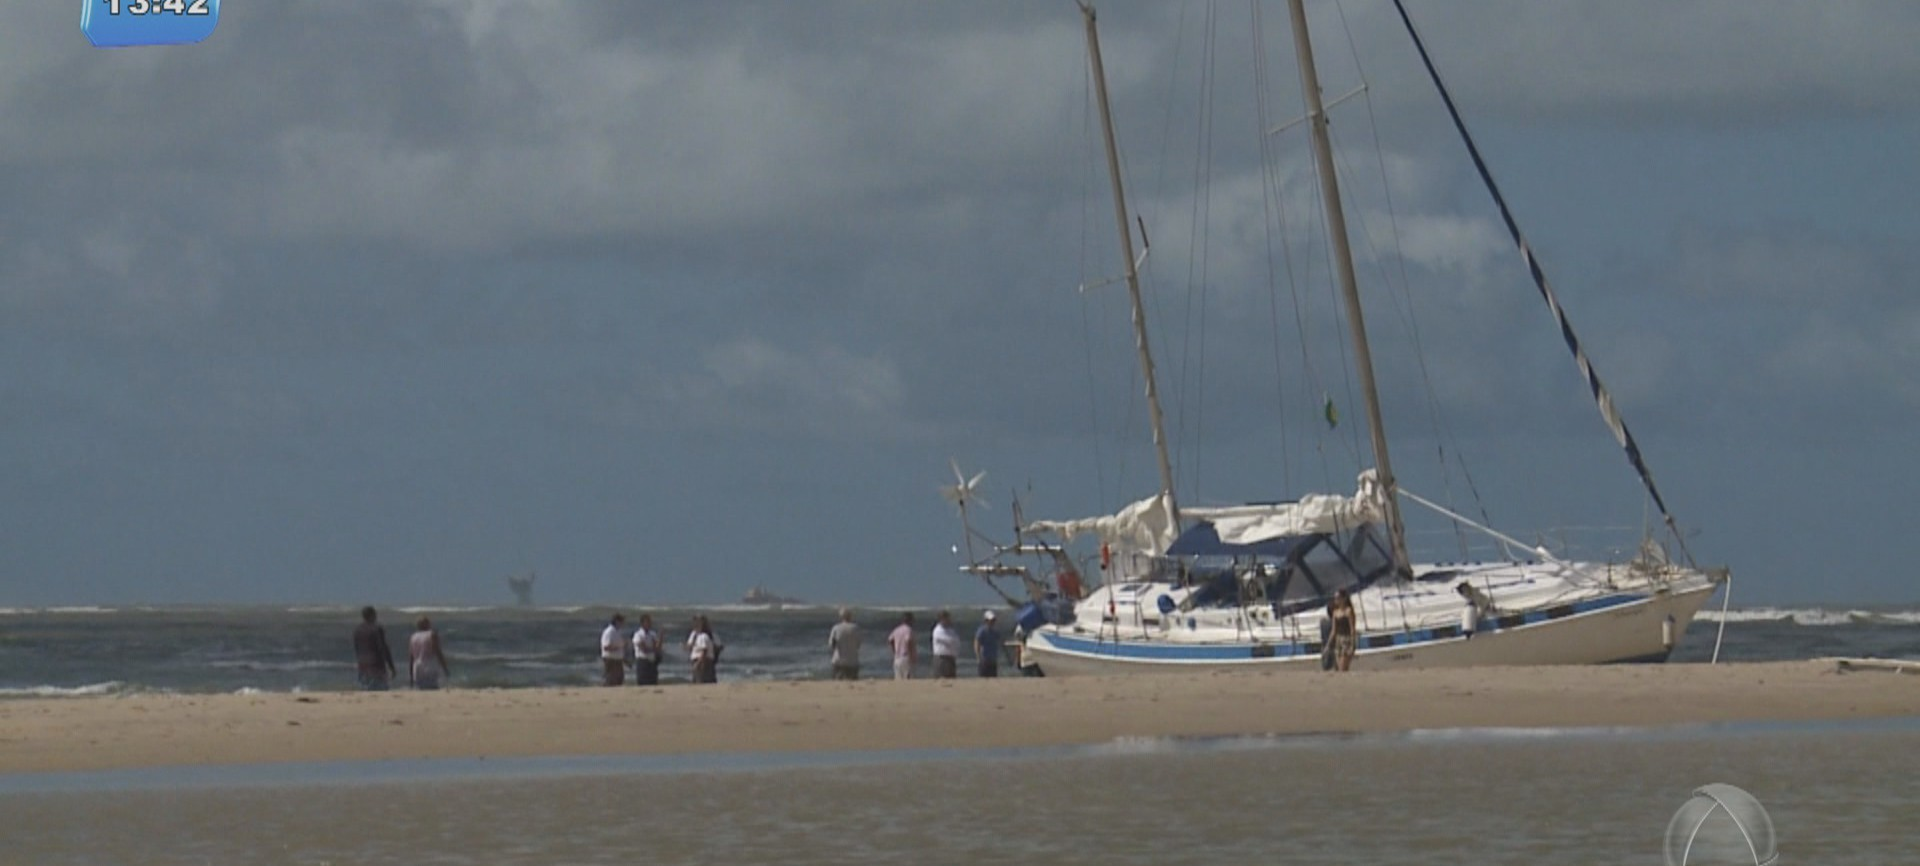 Veleiro continua encalhado na Praia dos Artistas